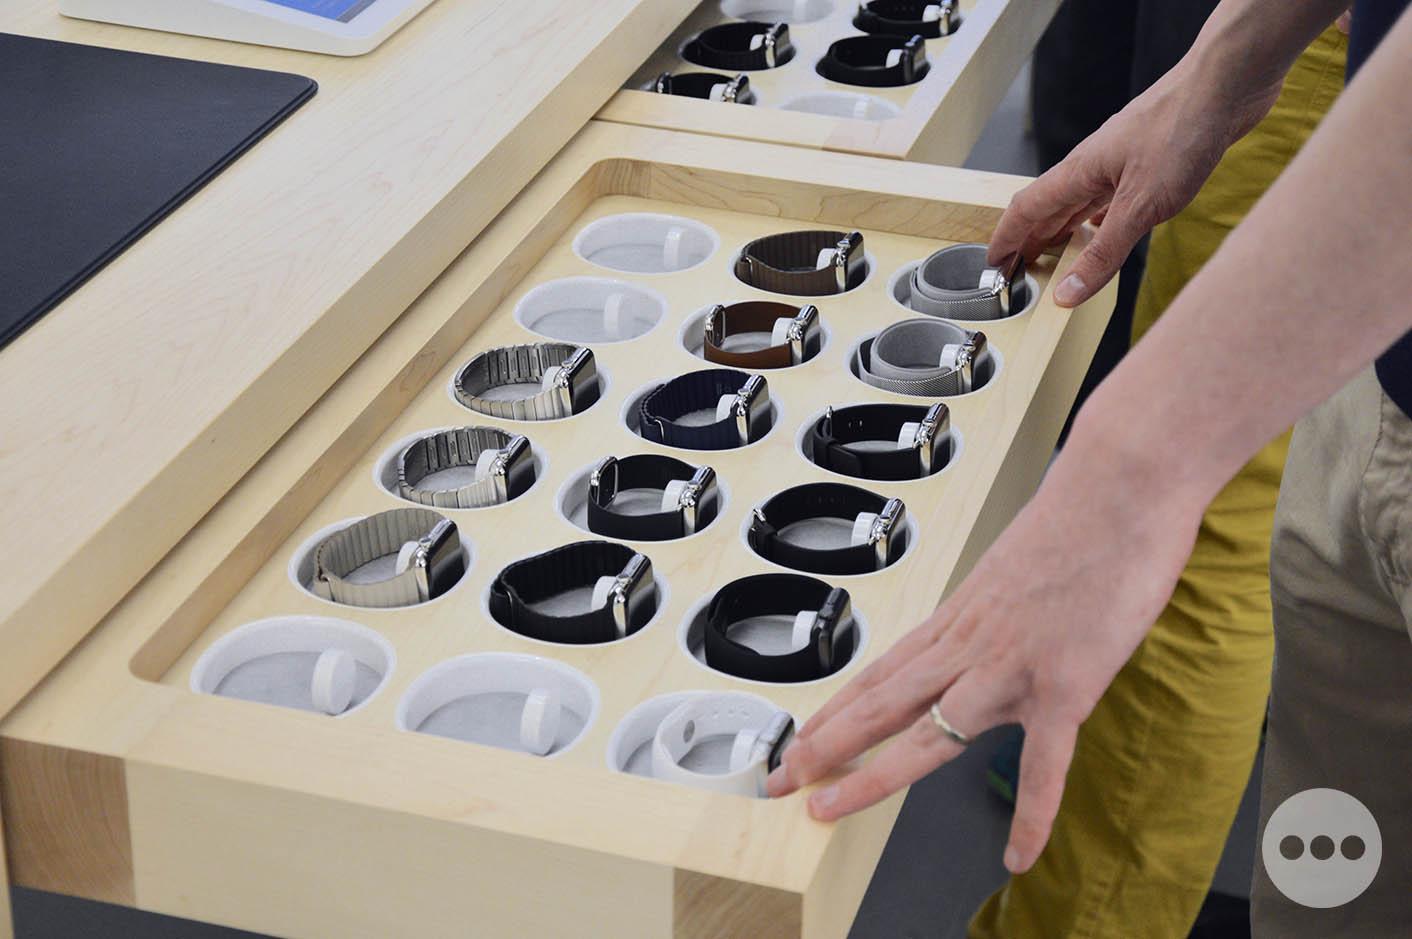 Apple Watch tiroir table